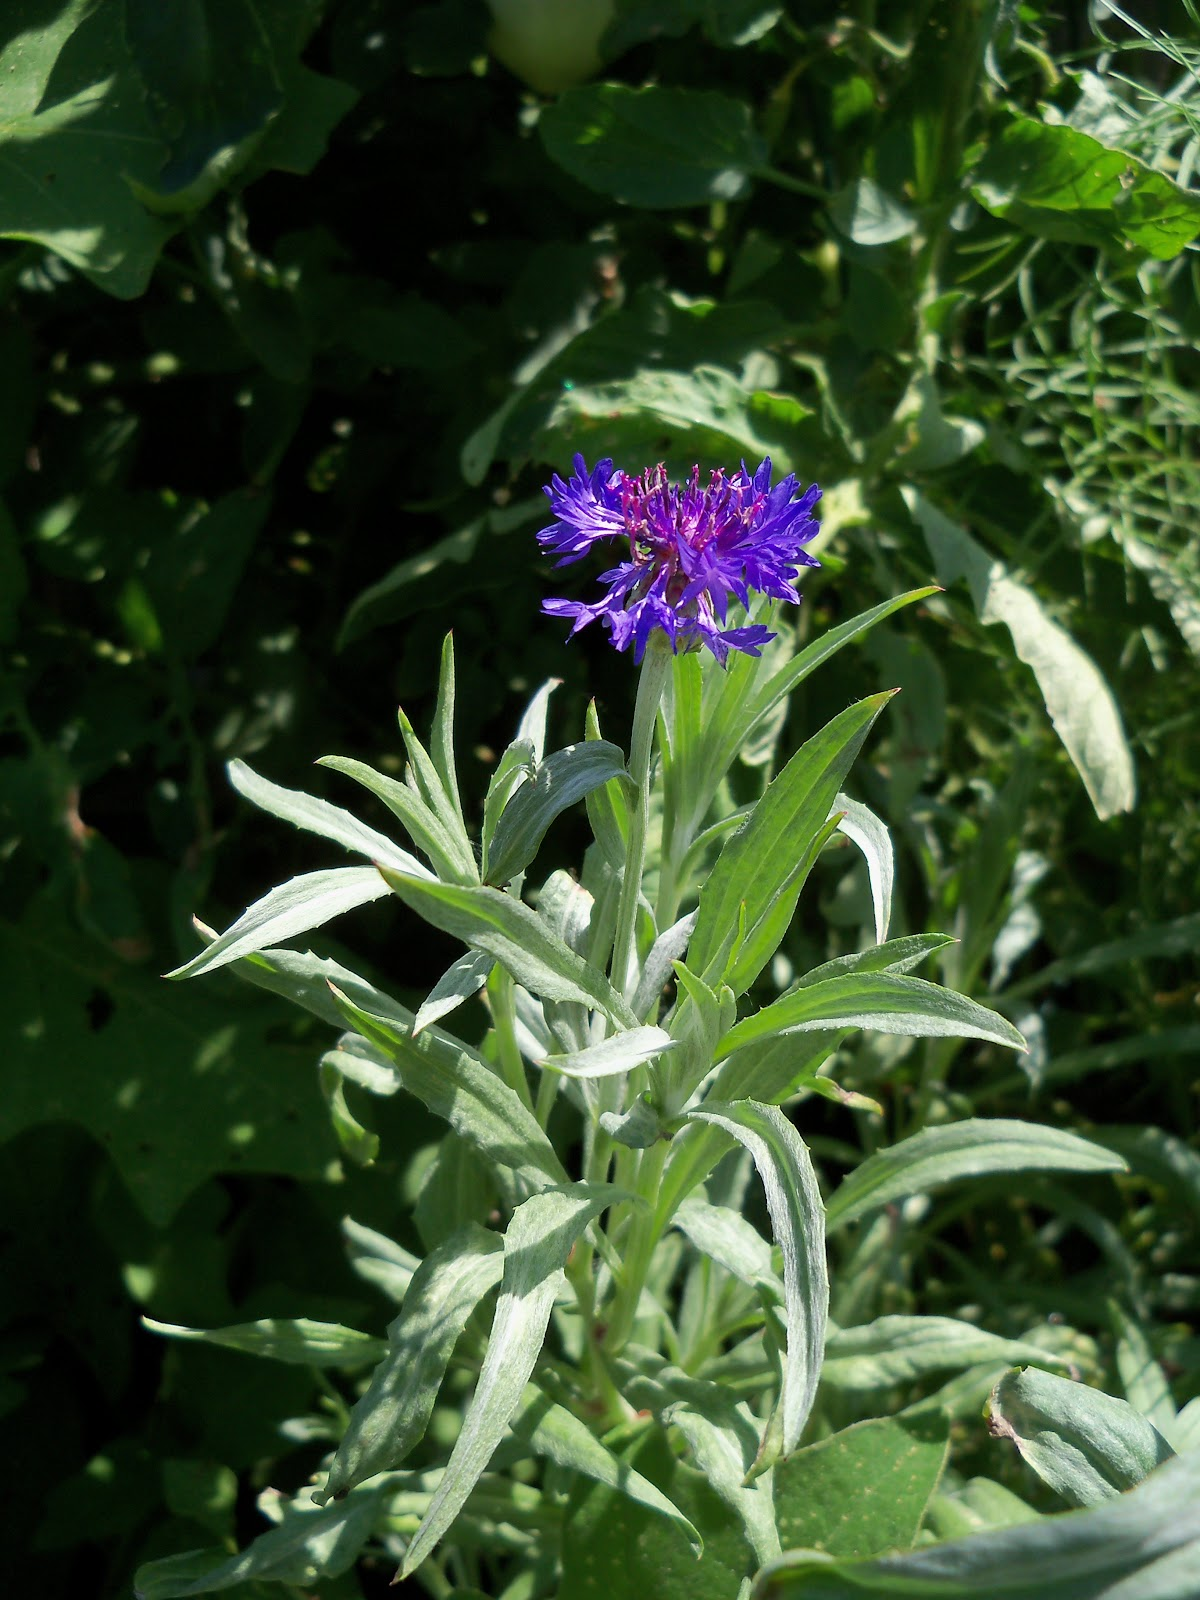 Gardening 2010, Part Three - 101_4421.JPG